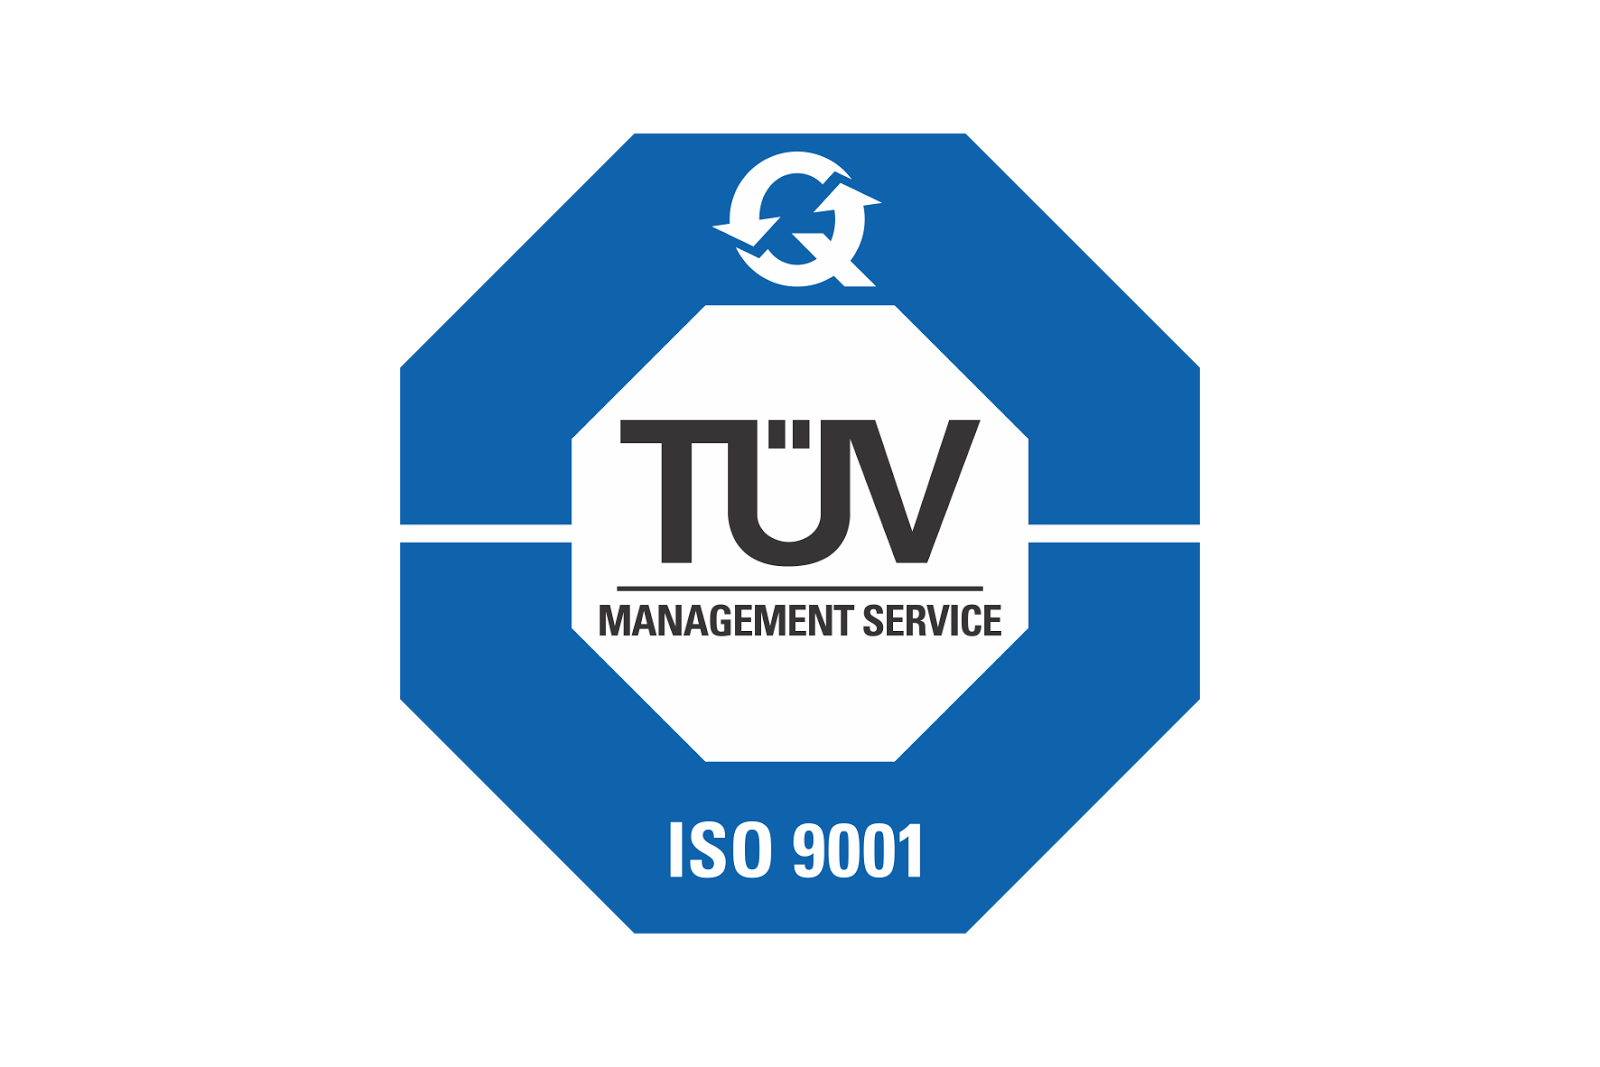 Logo%2BTUV_ISO_9001.png